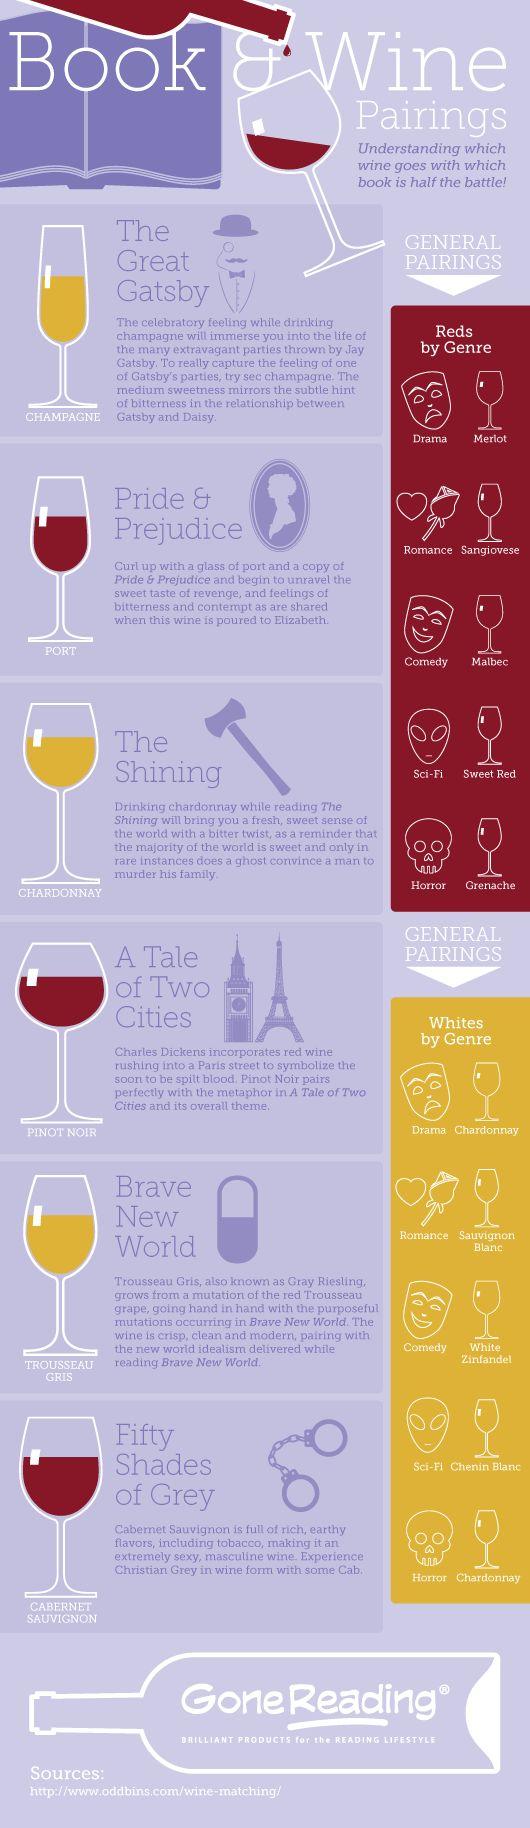 Book and Wine Pairings